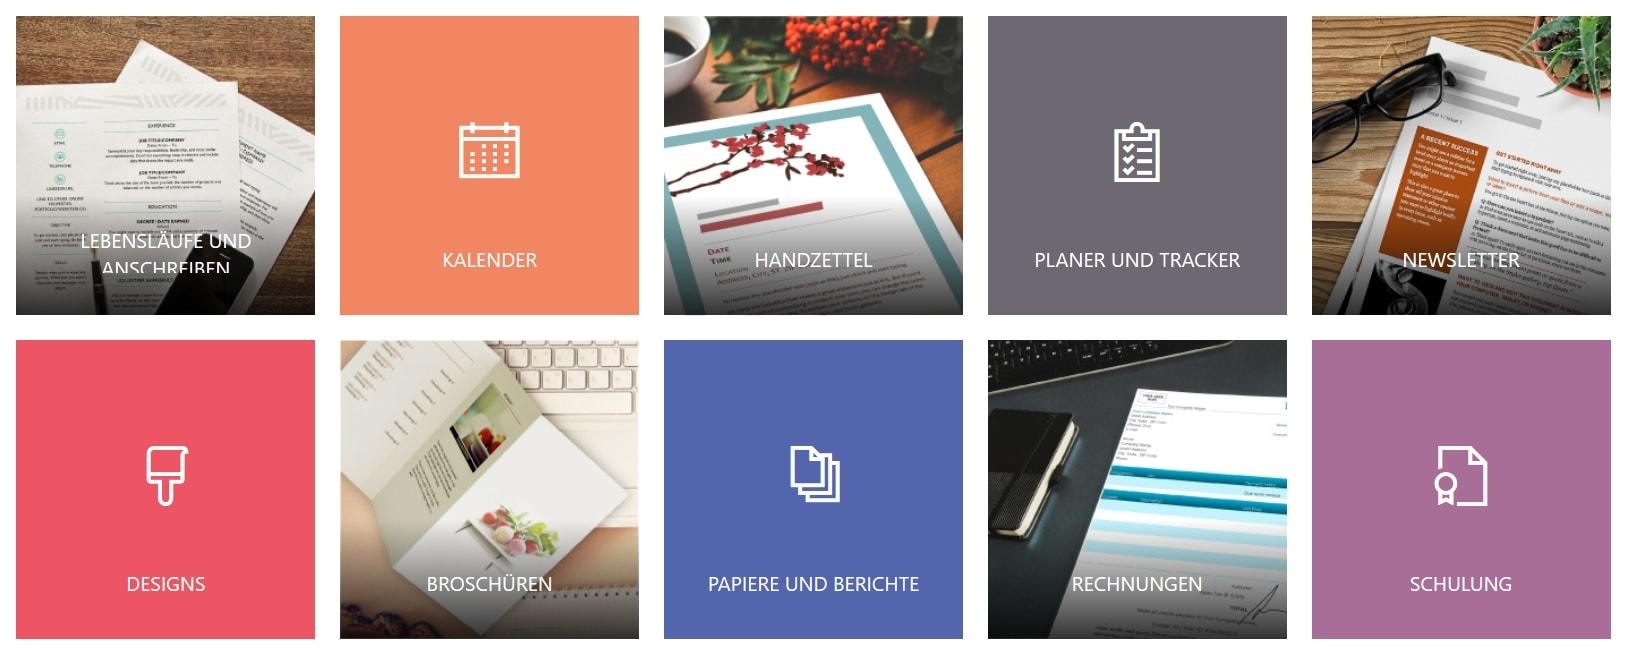 vorlagen designs f r microsoft office kostenlos ms office. Black Bedroom Furniture Sets. Home Design Ideas